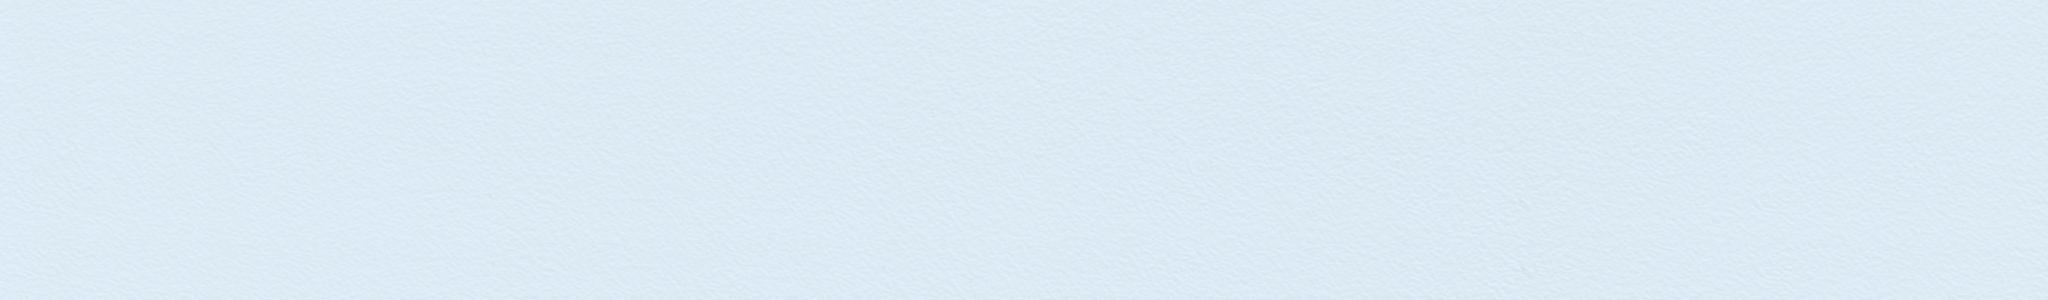 HU 158067 ABS hrana modrá pastelová perla XG